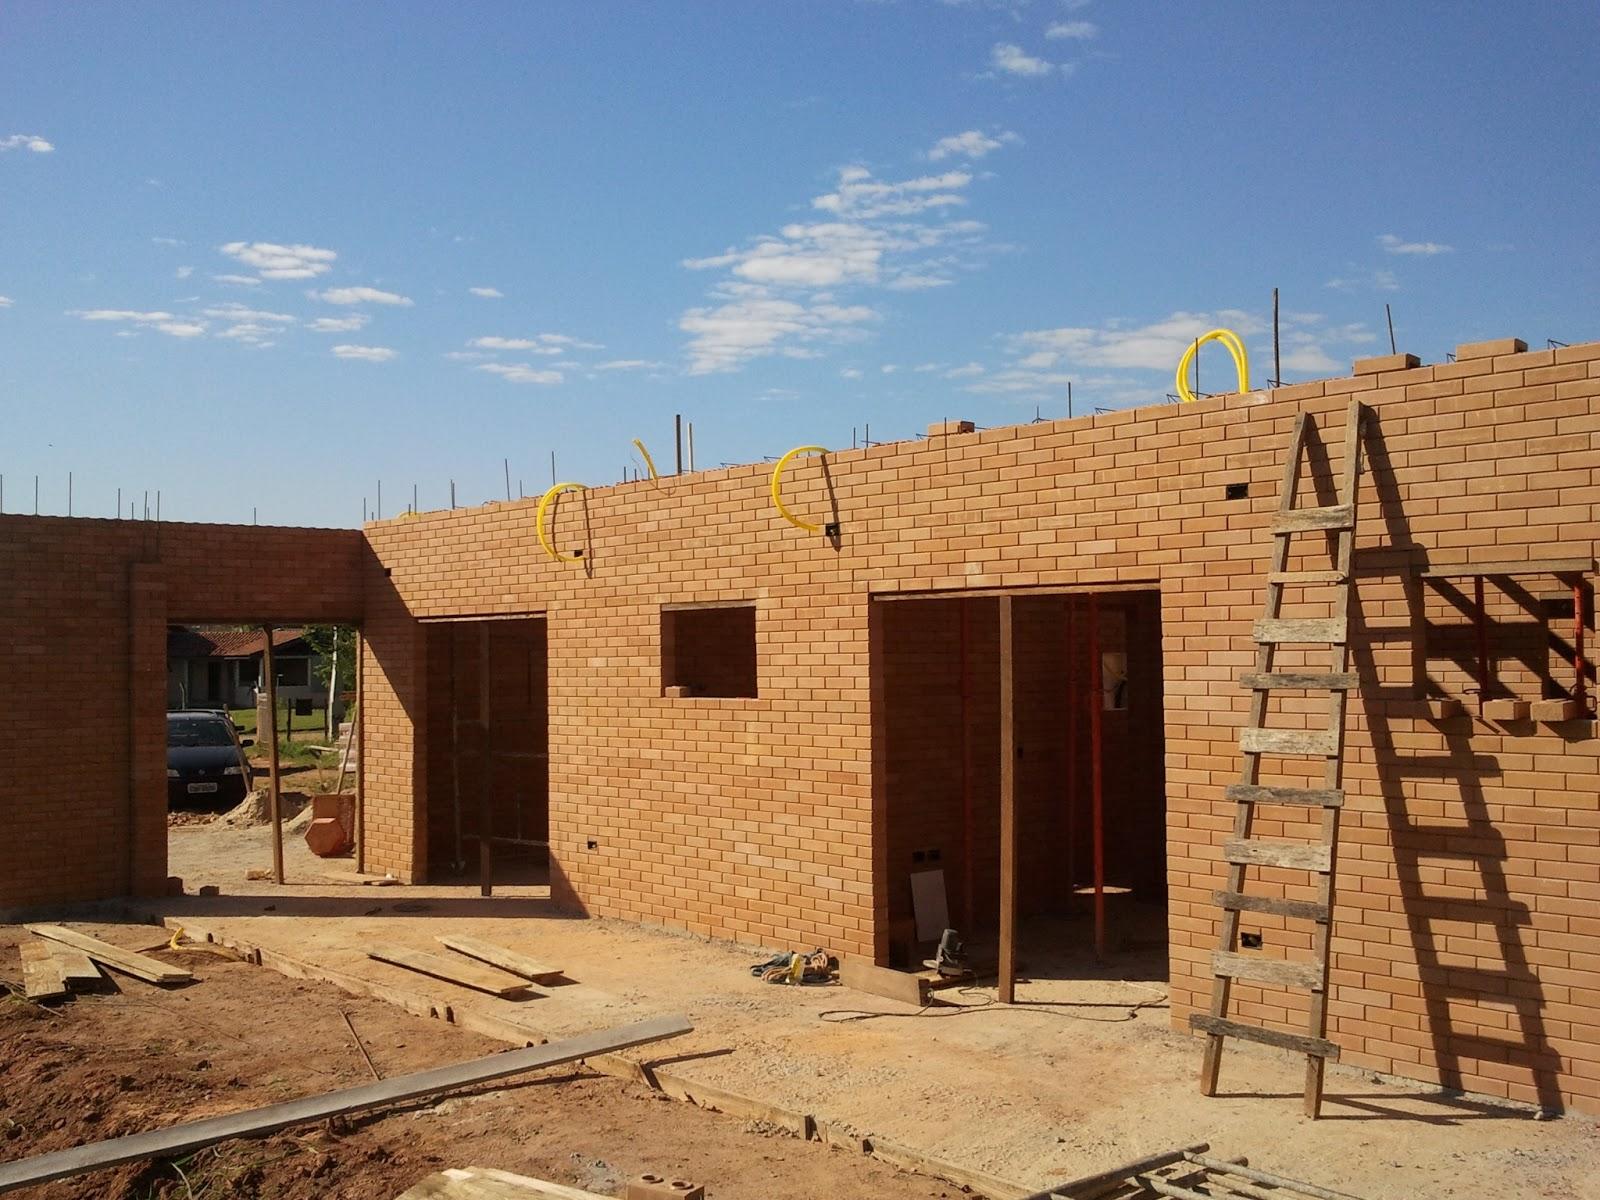 Construindo e Ampliando com Tijolo Solo cimento / Ecológico: Laje 1 #341A0E 1600x1200 Banheiro Com Tijolo Ecologico